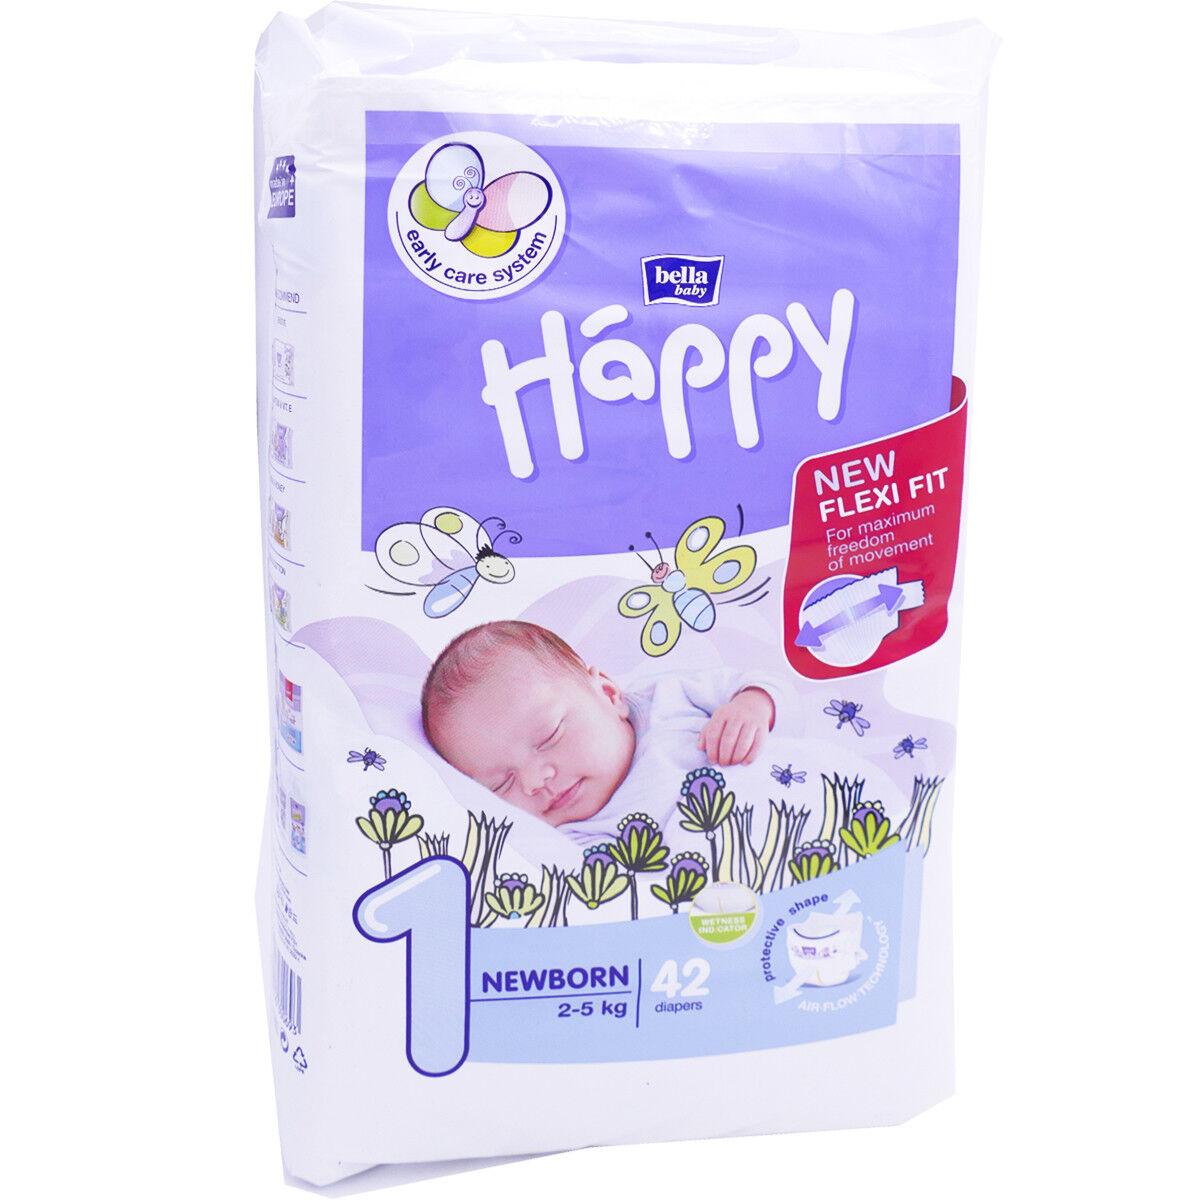 TETRA MEDICAL Happy 1 newborn 42 couches 2-5 kg